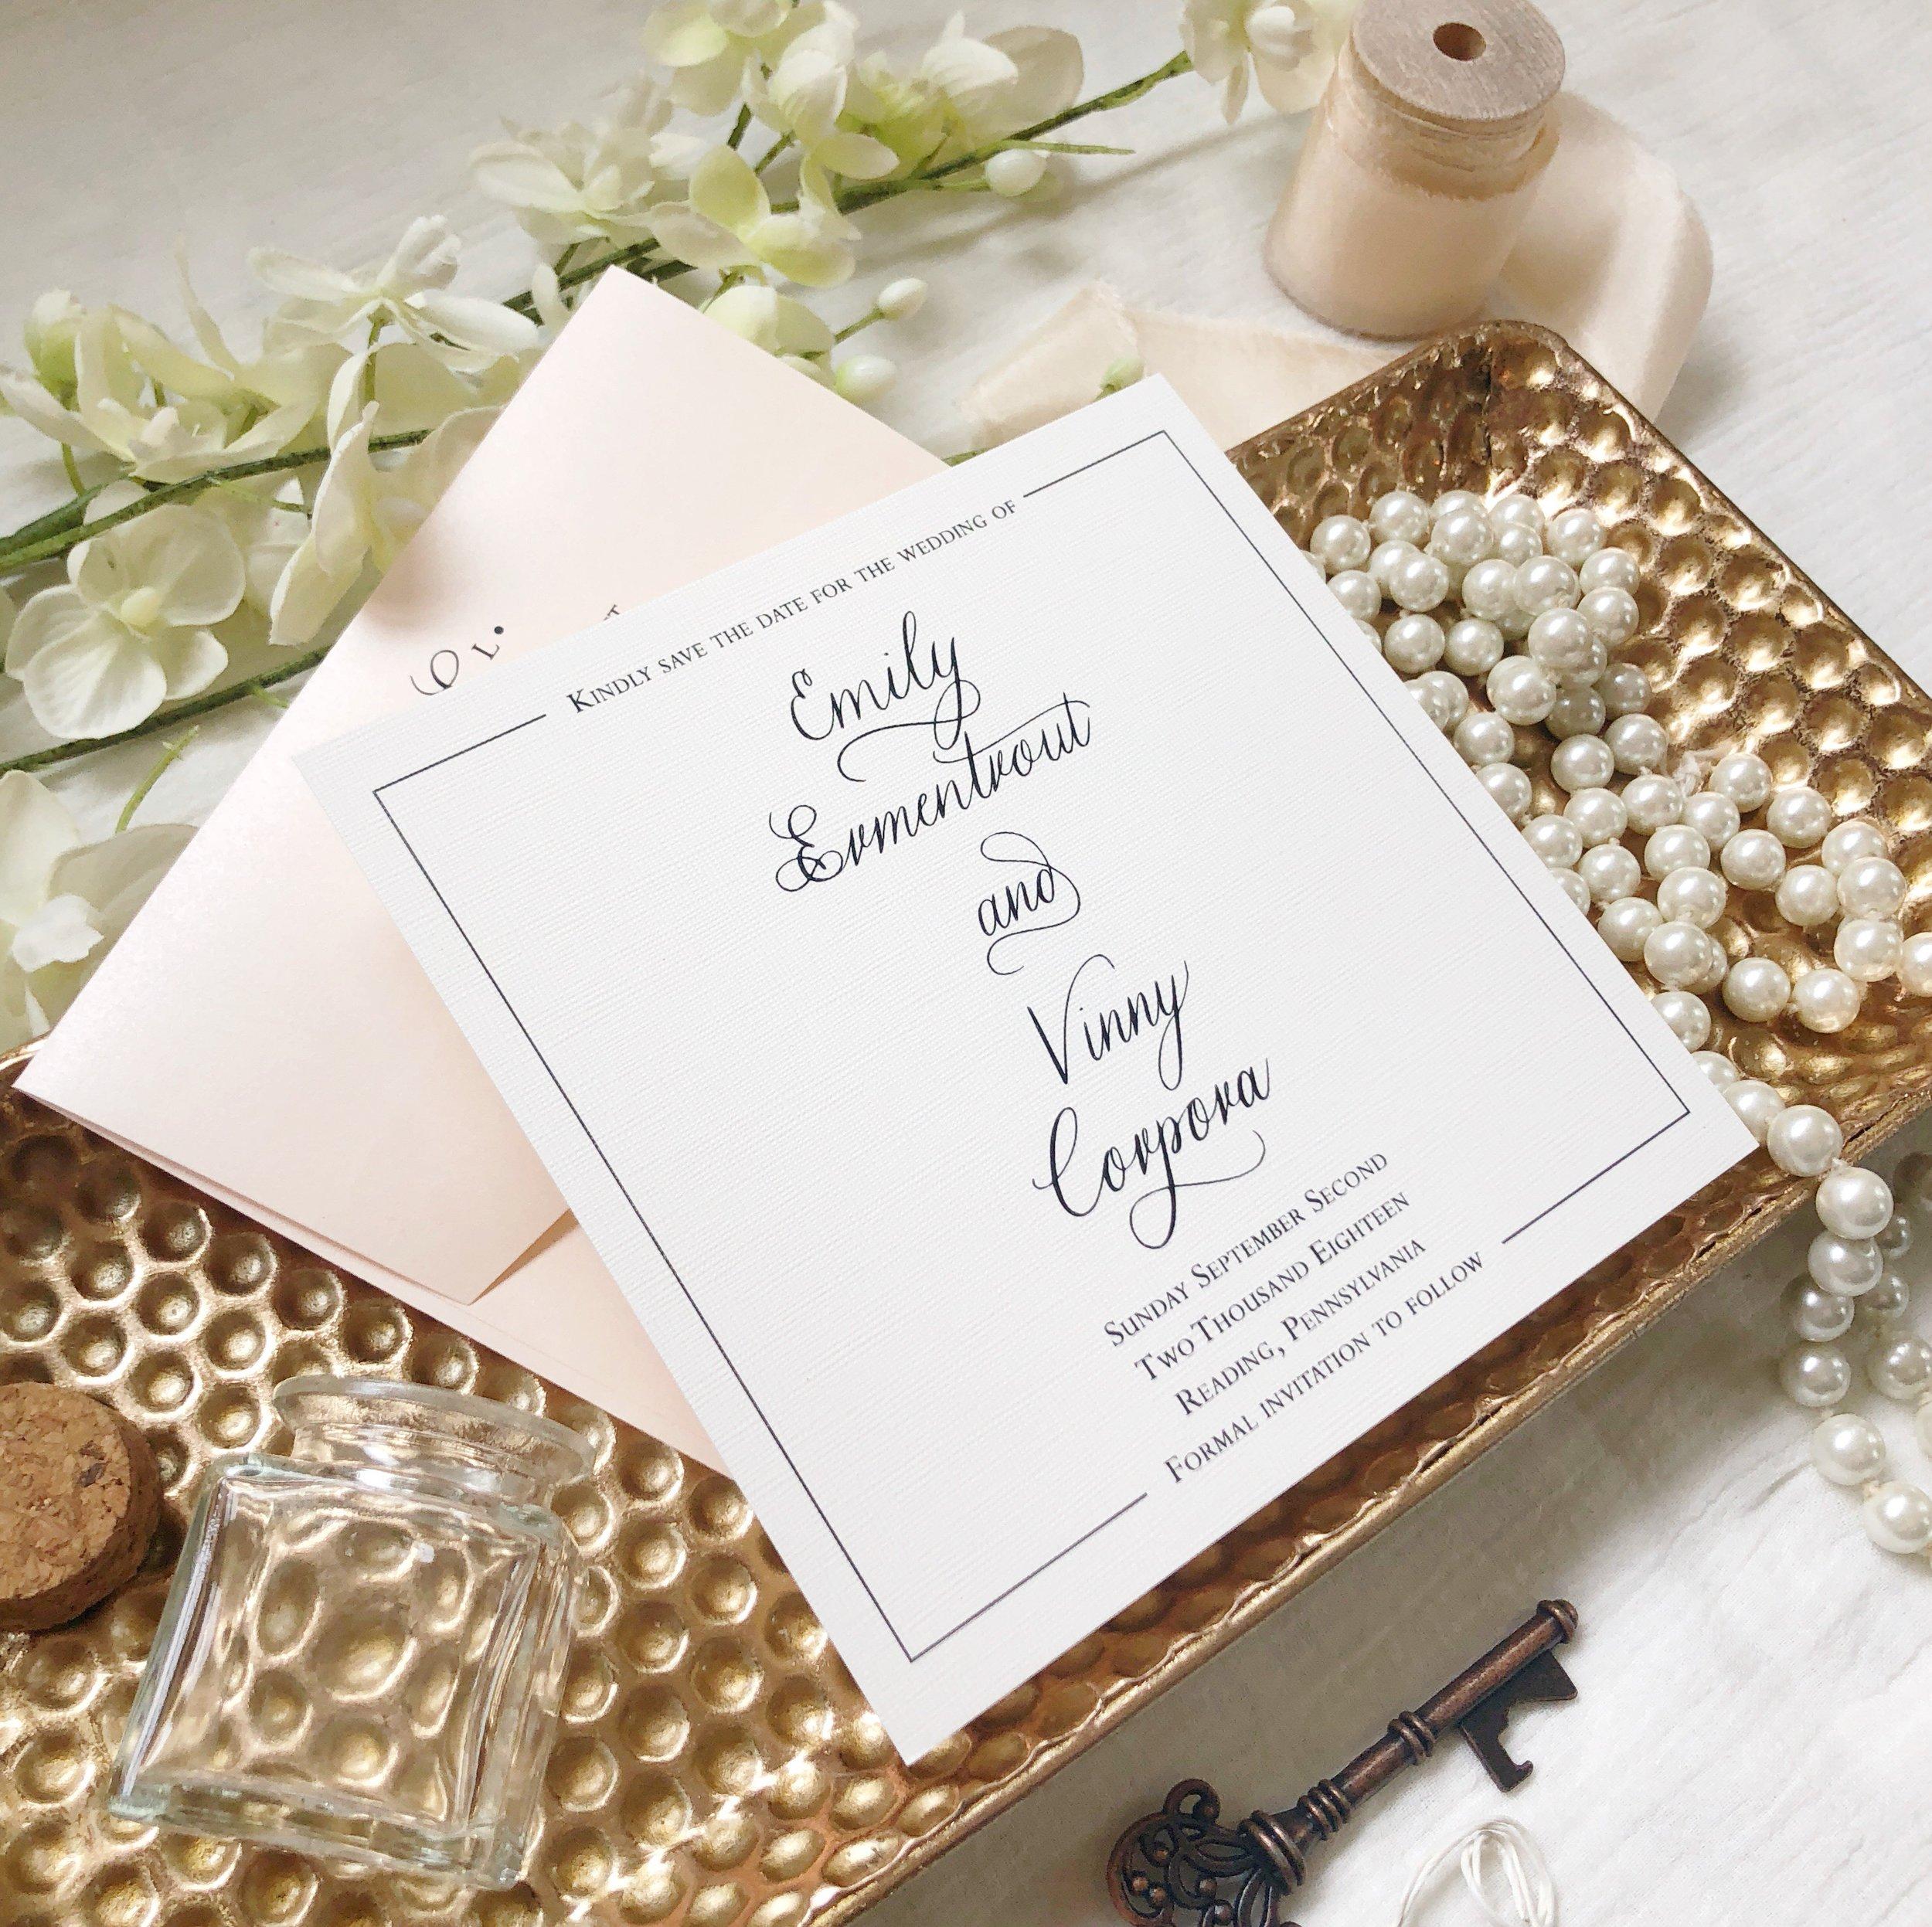 Central PA, York PA, JesSmith Designs, custom, wedding, invitations, bridal, announcements, save the date, baby, hanover, calligraphy, baltimore, wedding invitations, lancaster, gettysburg-05-06 11.36.06.jpg